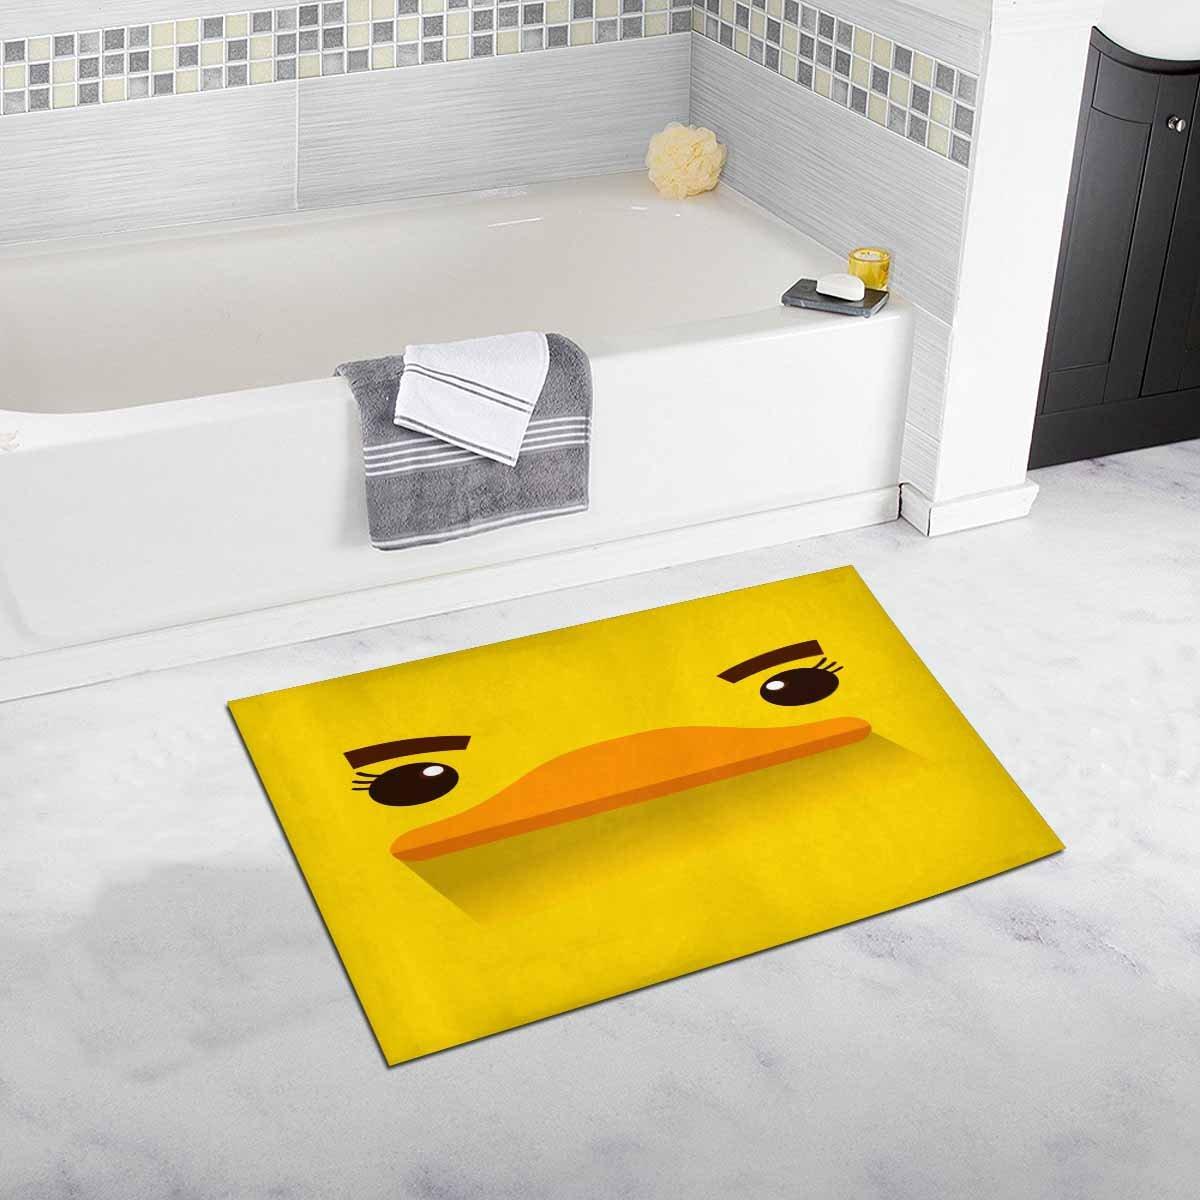 InterestPrint Cartoon Yellow Duck Face Funny Animal Bath Mat Soft Bathroom Rugs Non-slip Rubber0 20 W X 32 L Inches